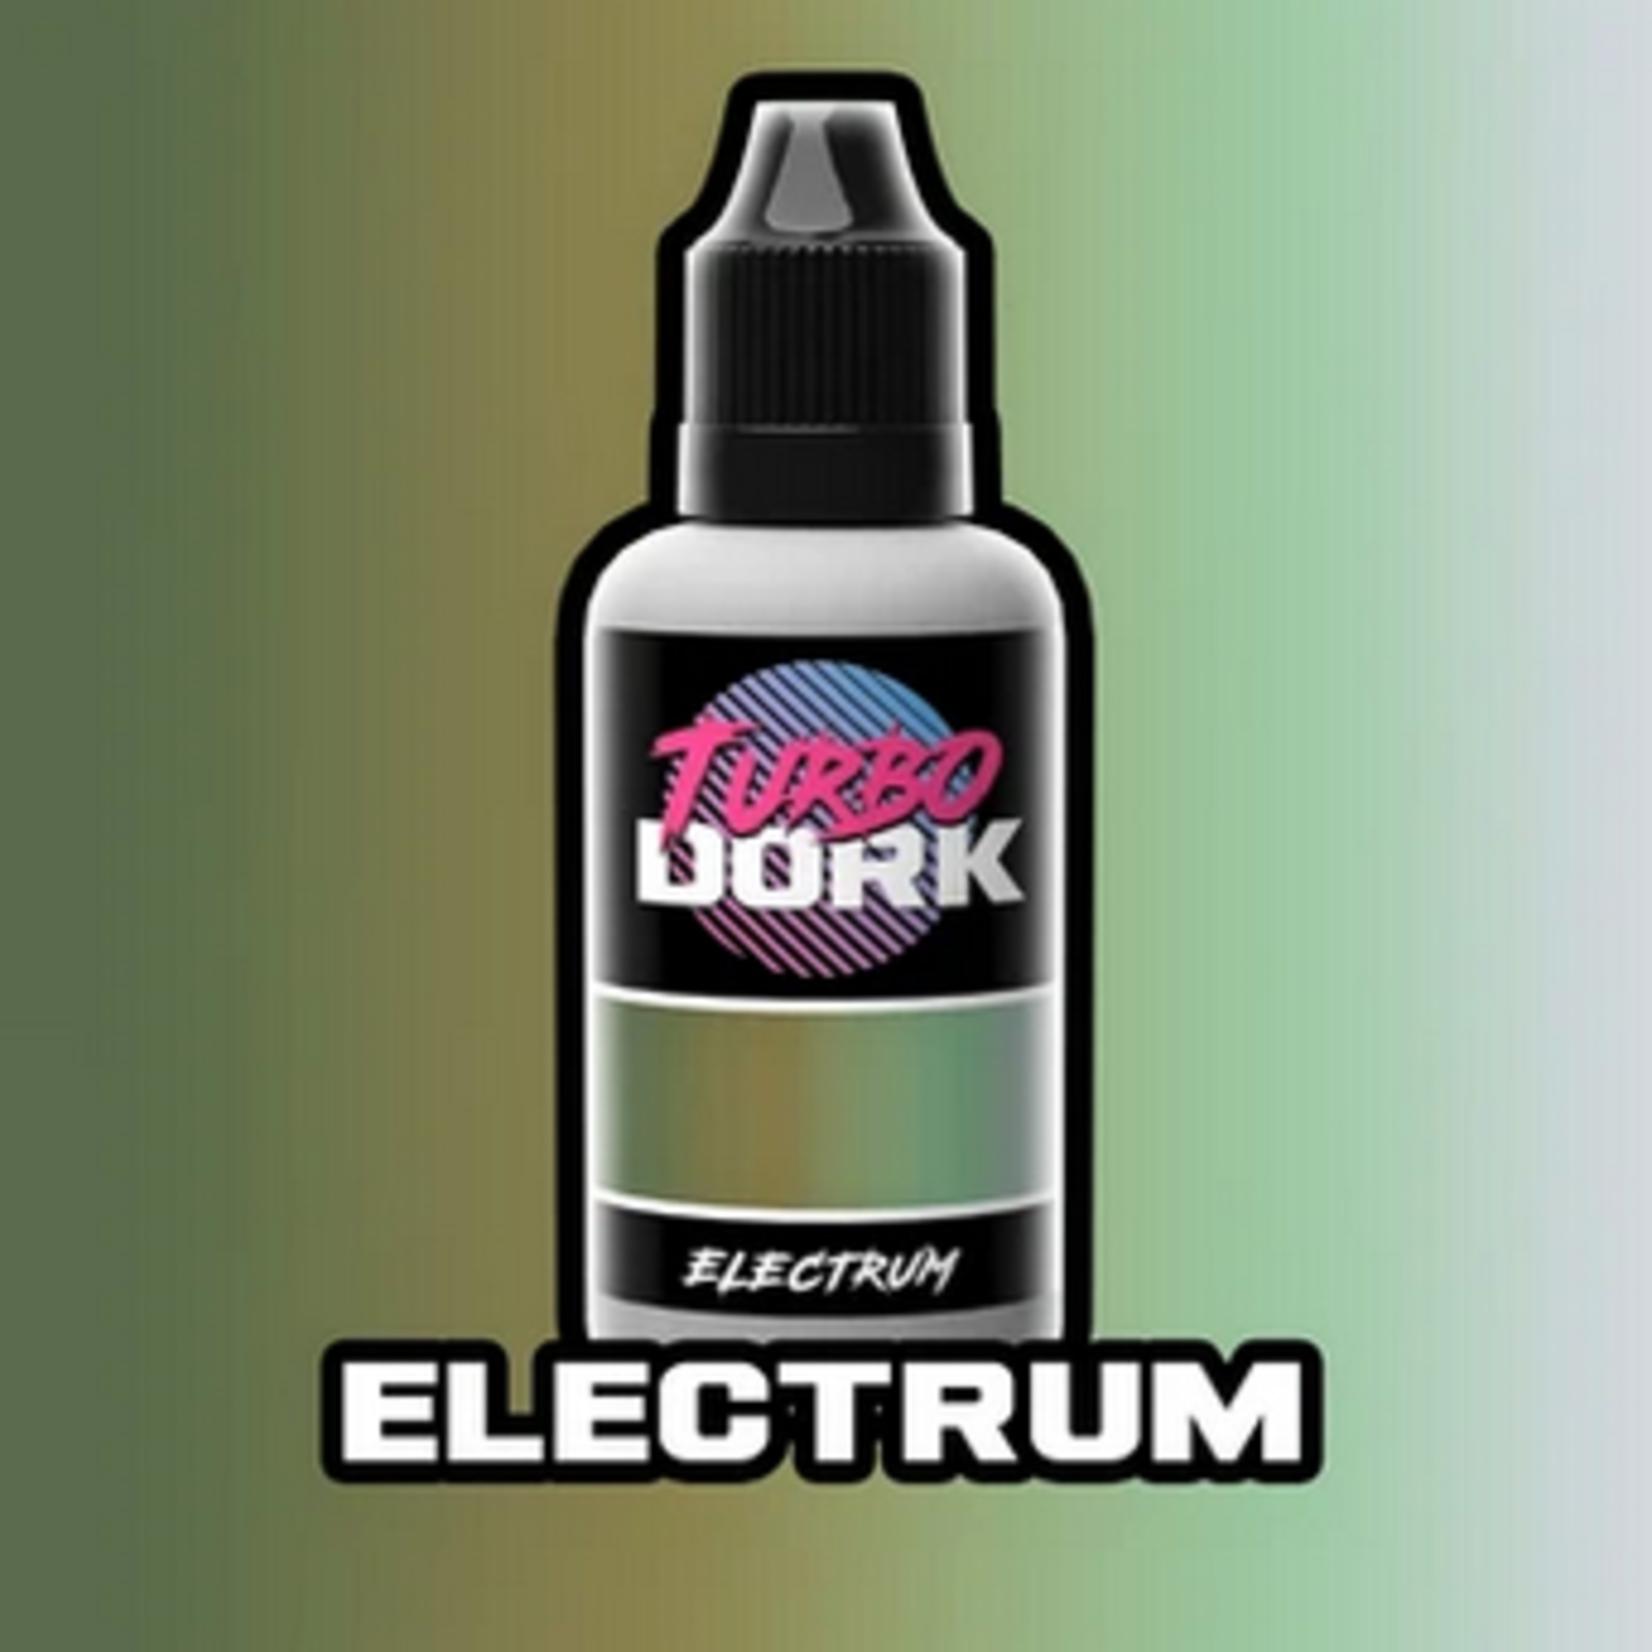 Turbo Dork: Electrum 20ml